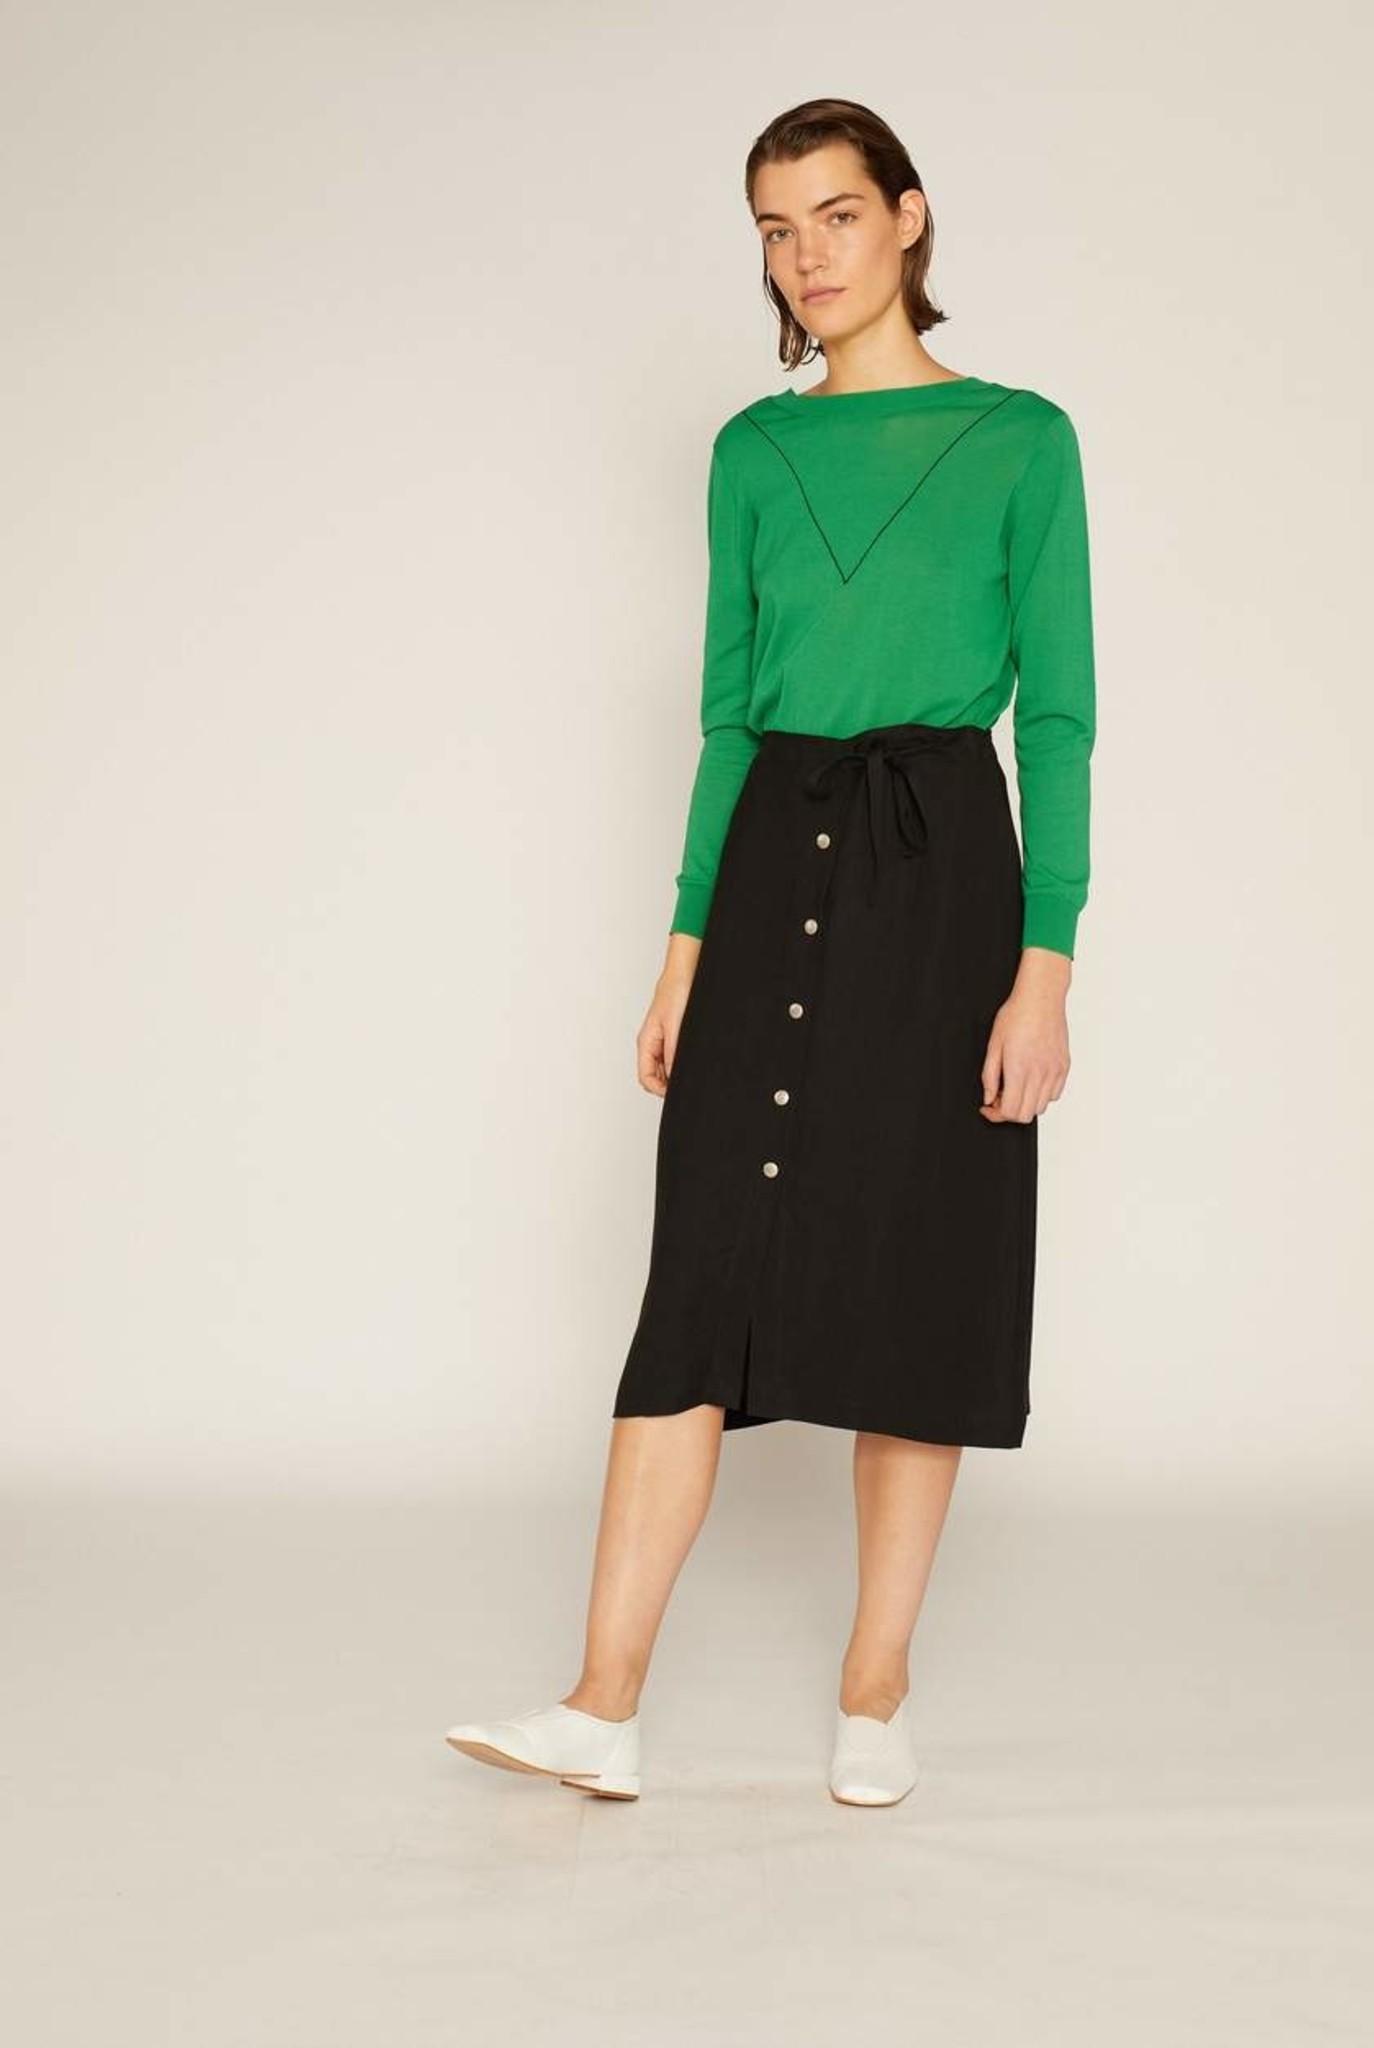 Calisti skirt black